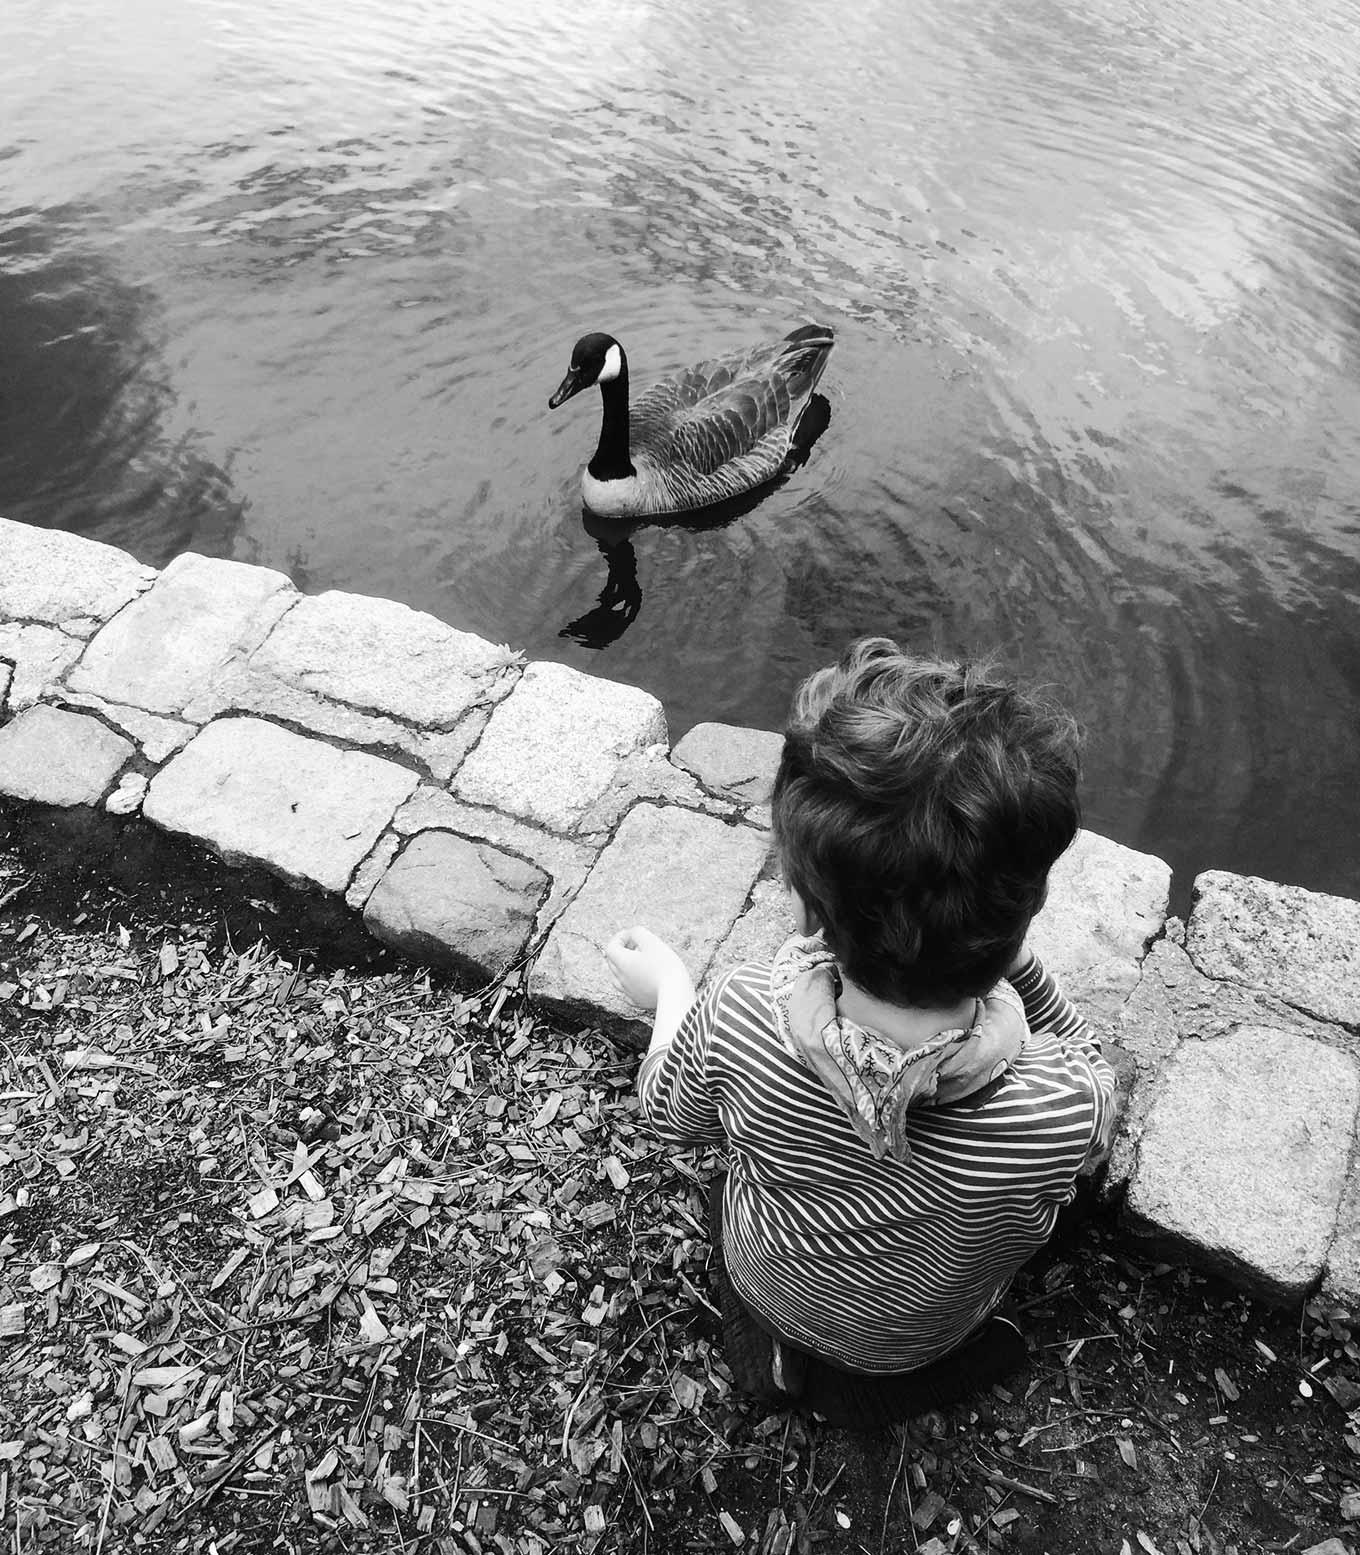 2014-05-28-c-pond@2x